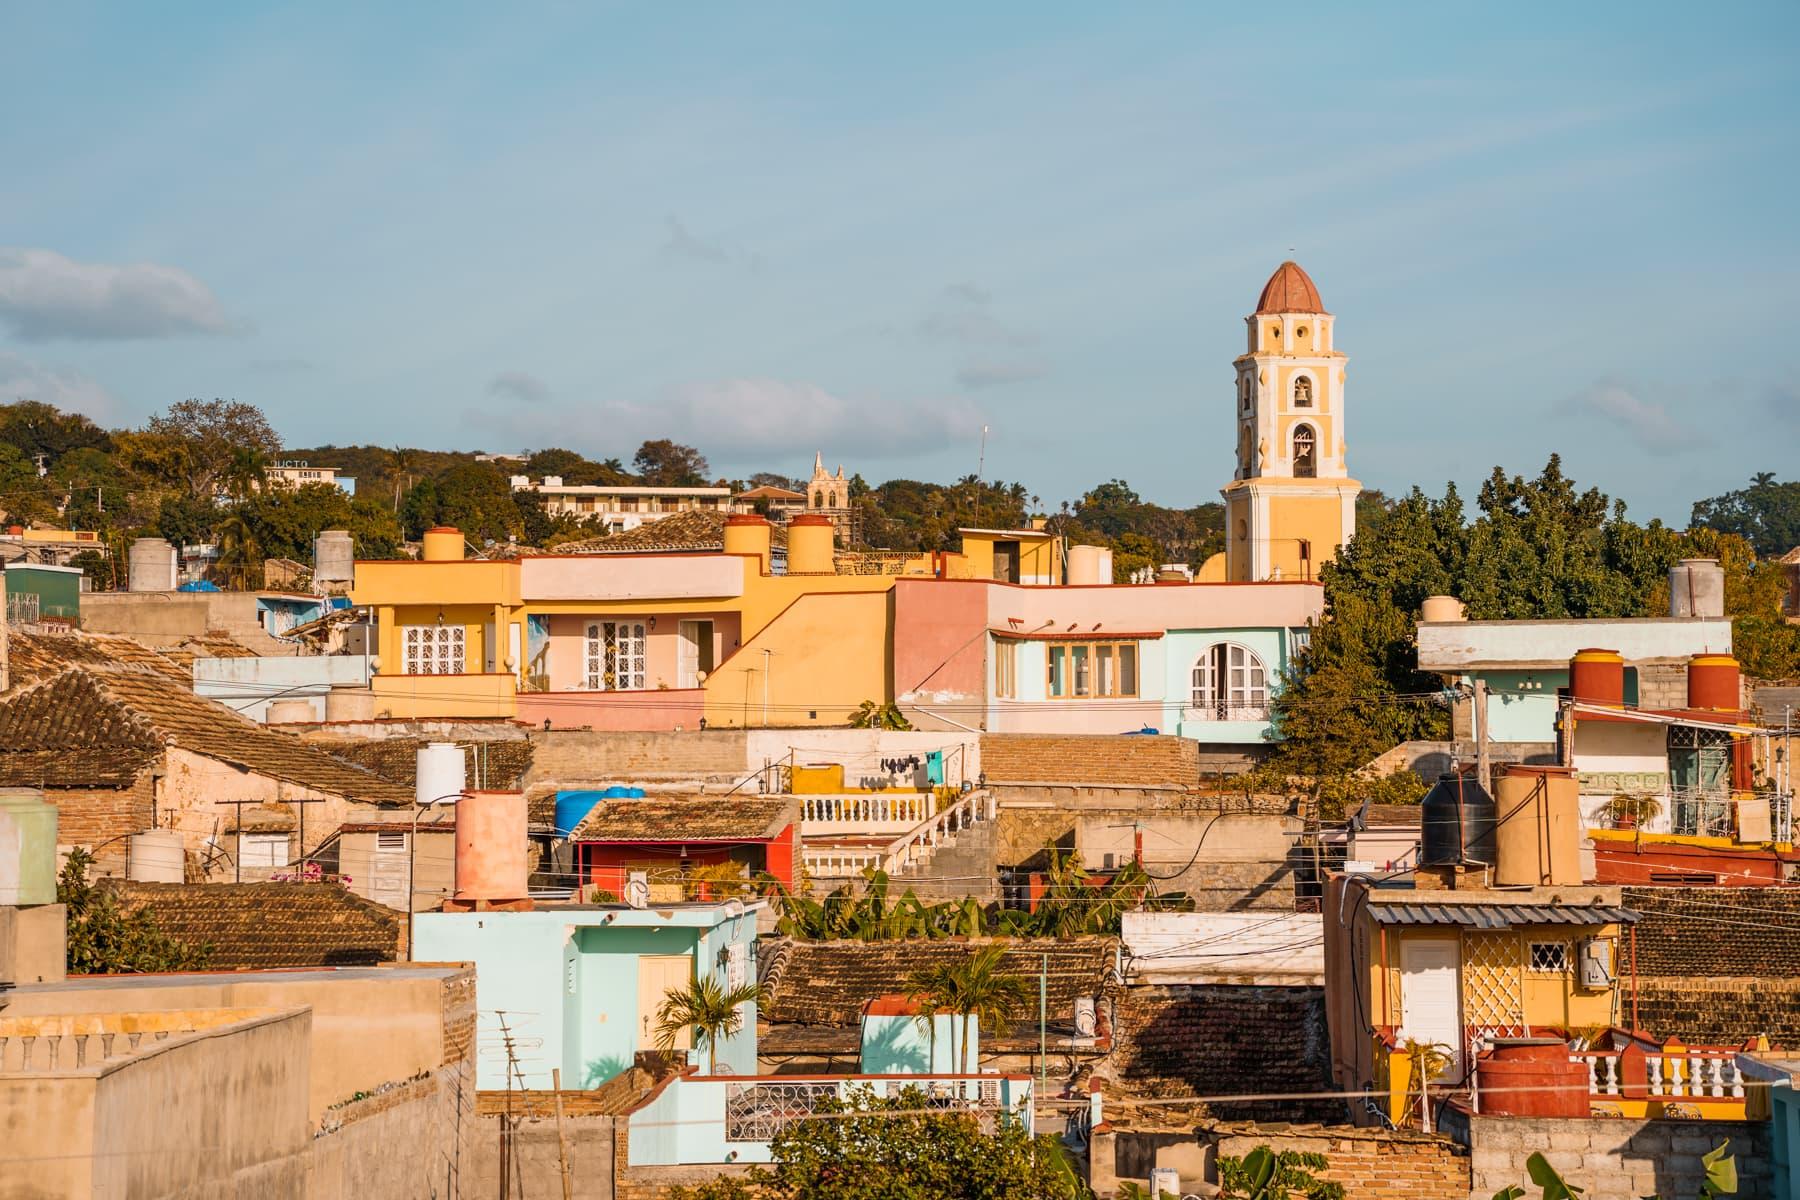 Casa Particular in Trinidad - Unterkünfte auf Kuba